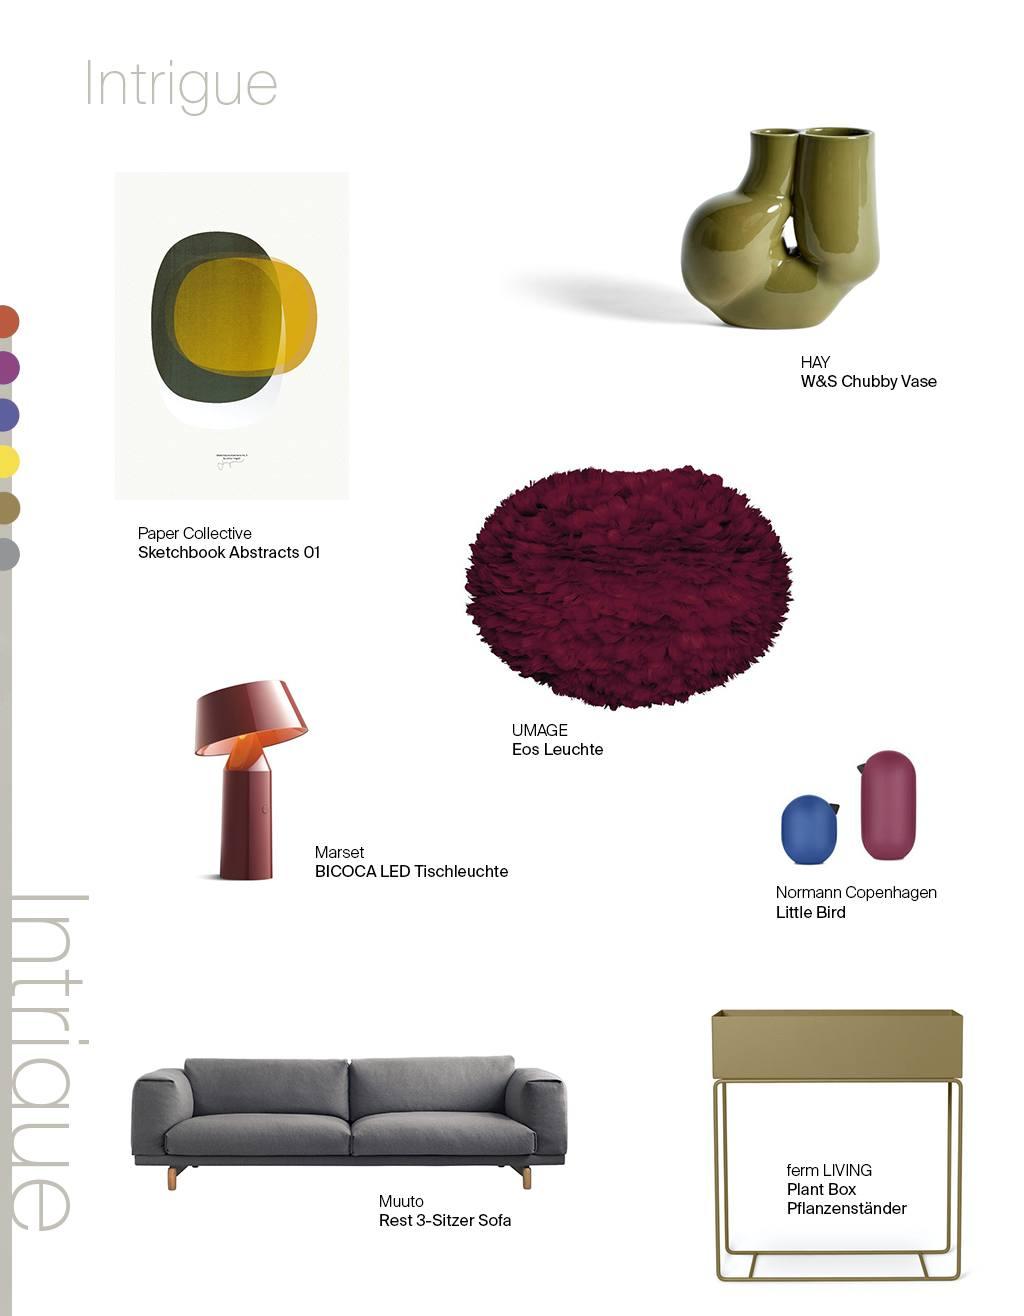 1 Möbel, 3 Looks: Pantone Special. Intrigue